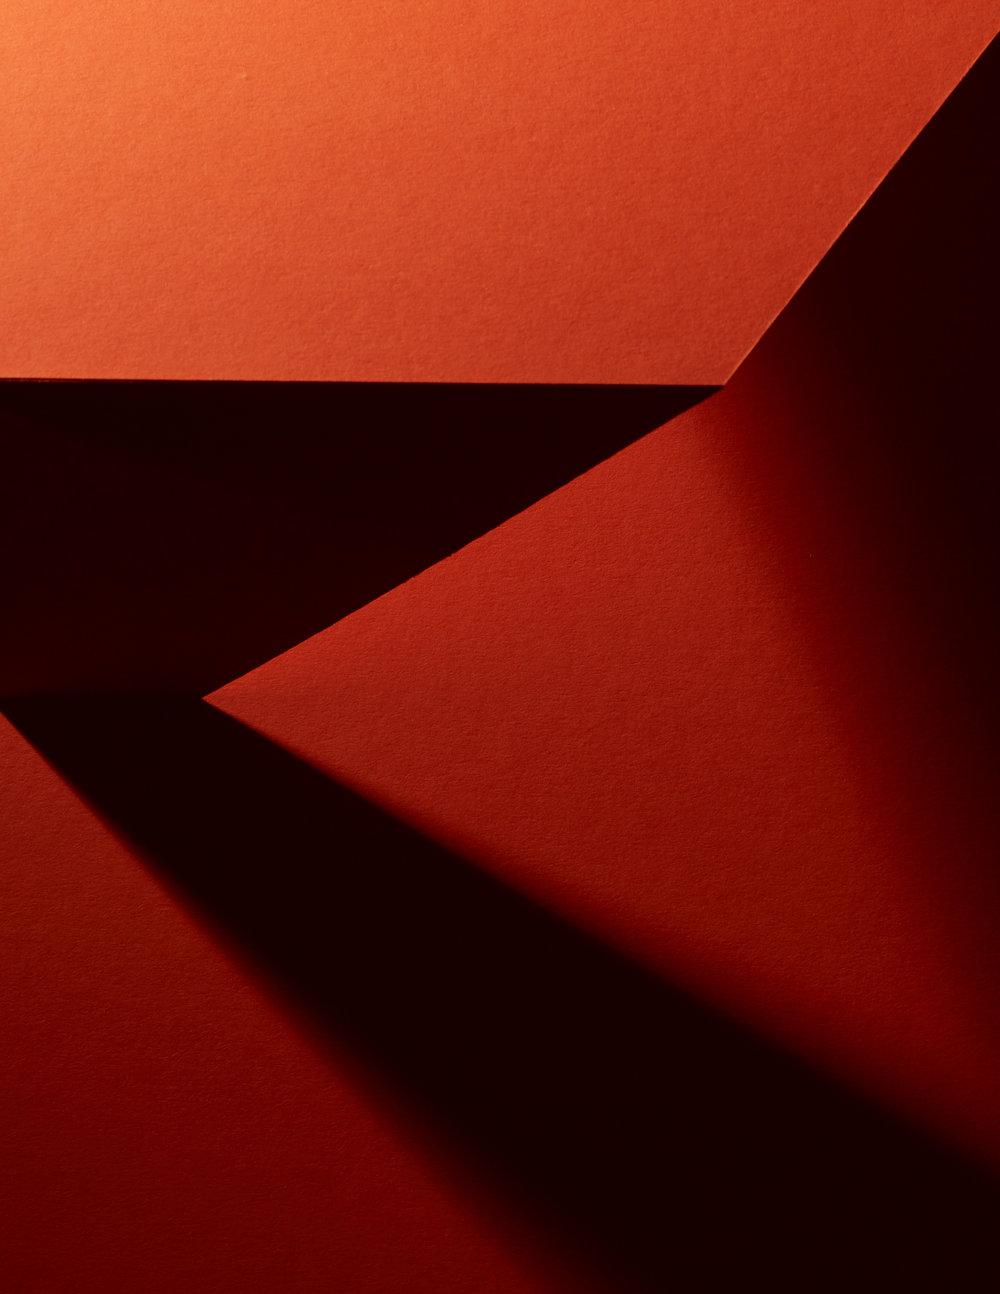 RED MINIMAL.jpg